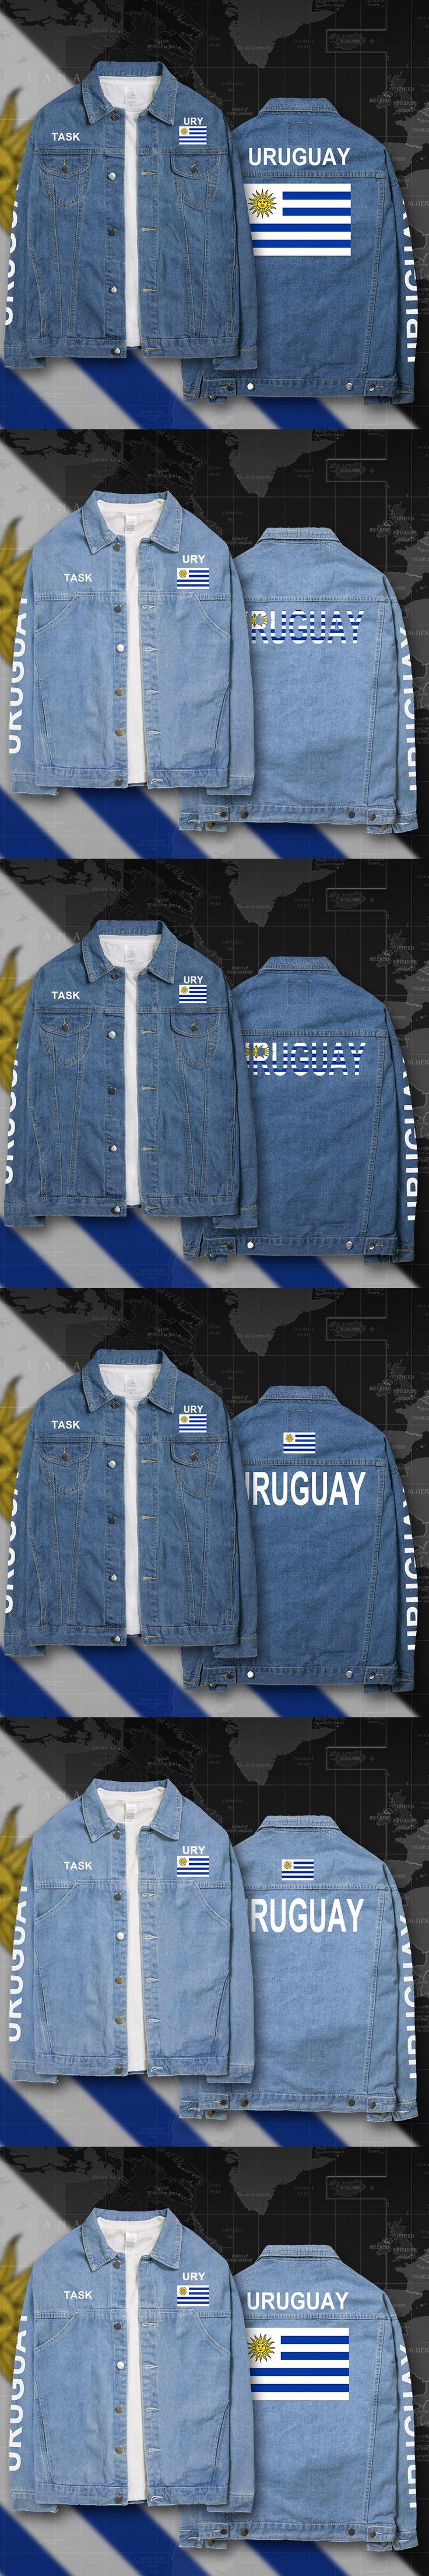 Uruguay Uruguayan URY UY denim jackets men coat men's suits jeans jacket thin jaquetas 2017 sunscreen autumn spring nation flag